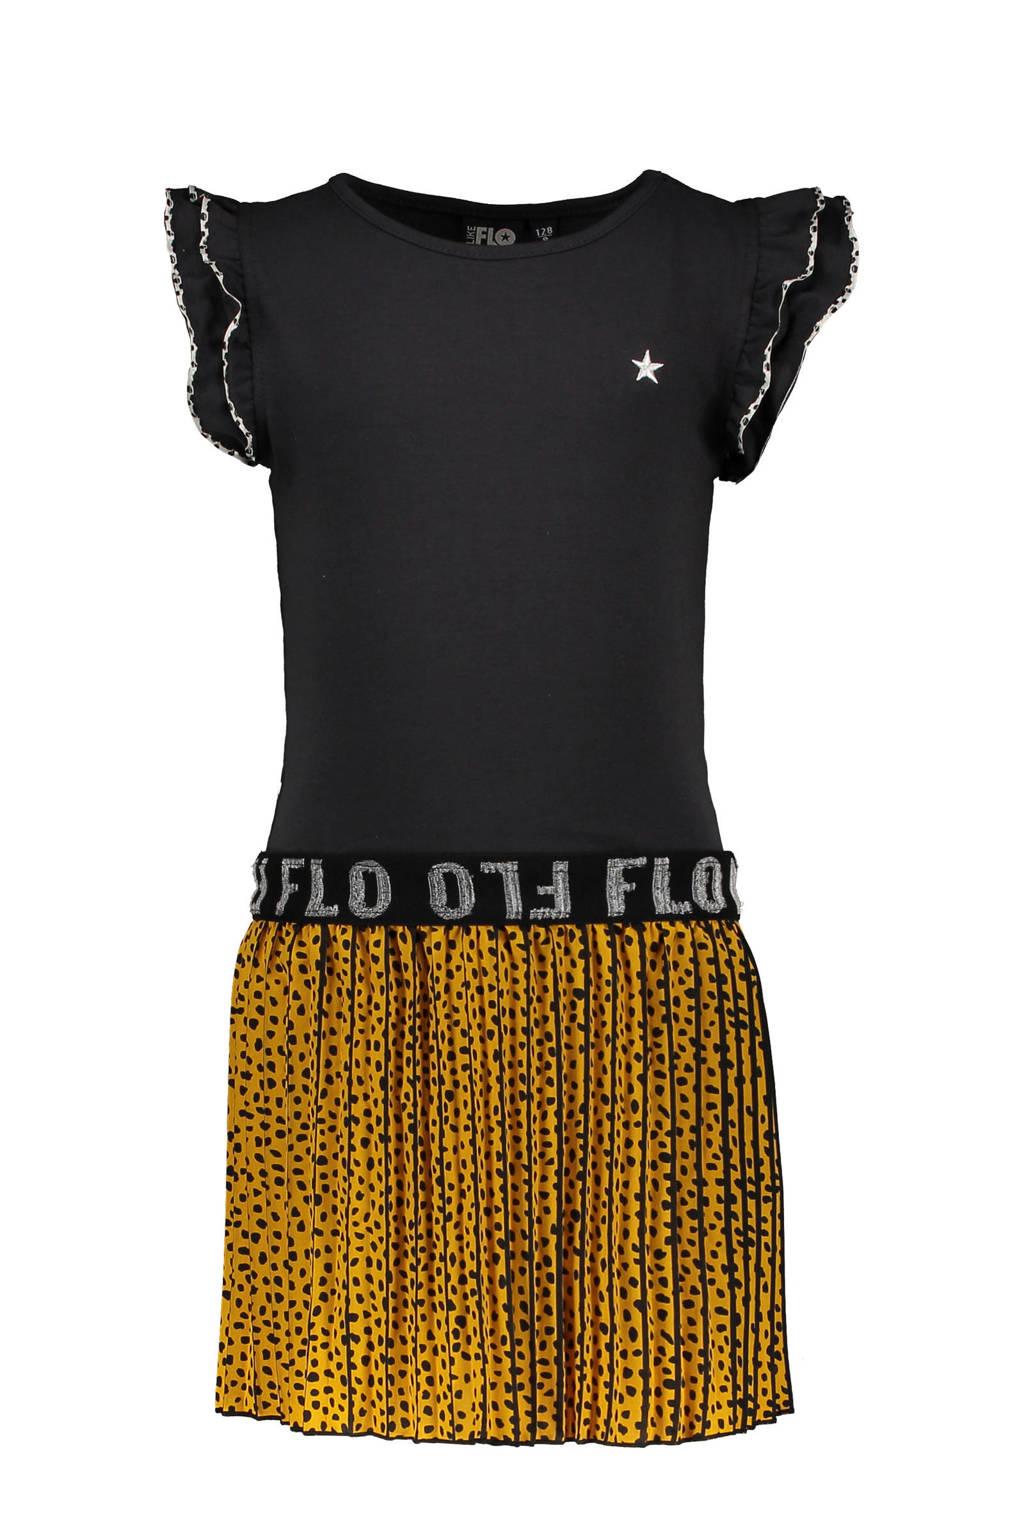 Like Flo jersey jurk met dierenprint en ruches antraciet/okergeel